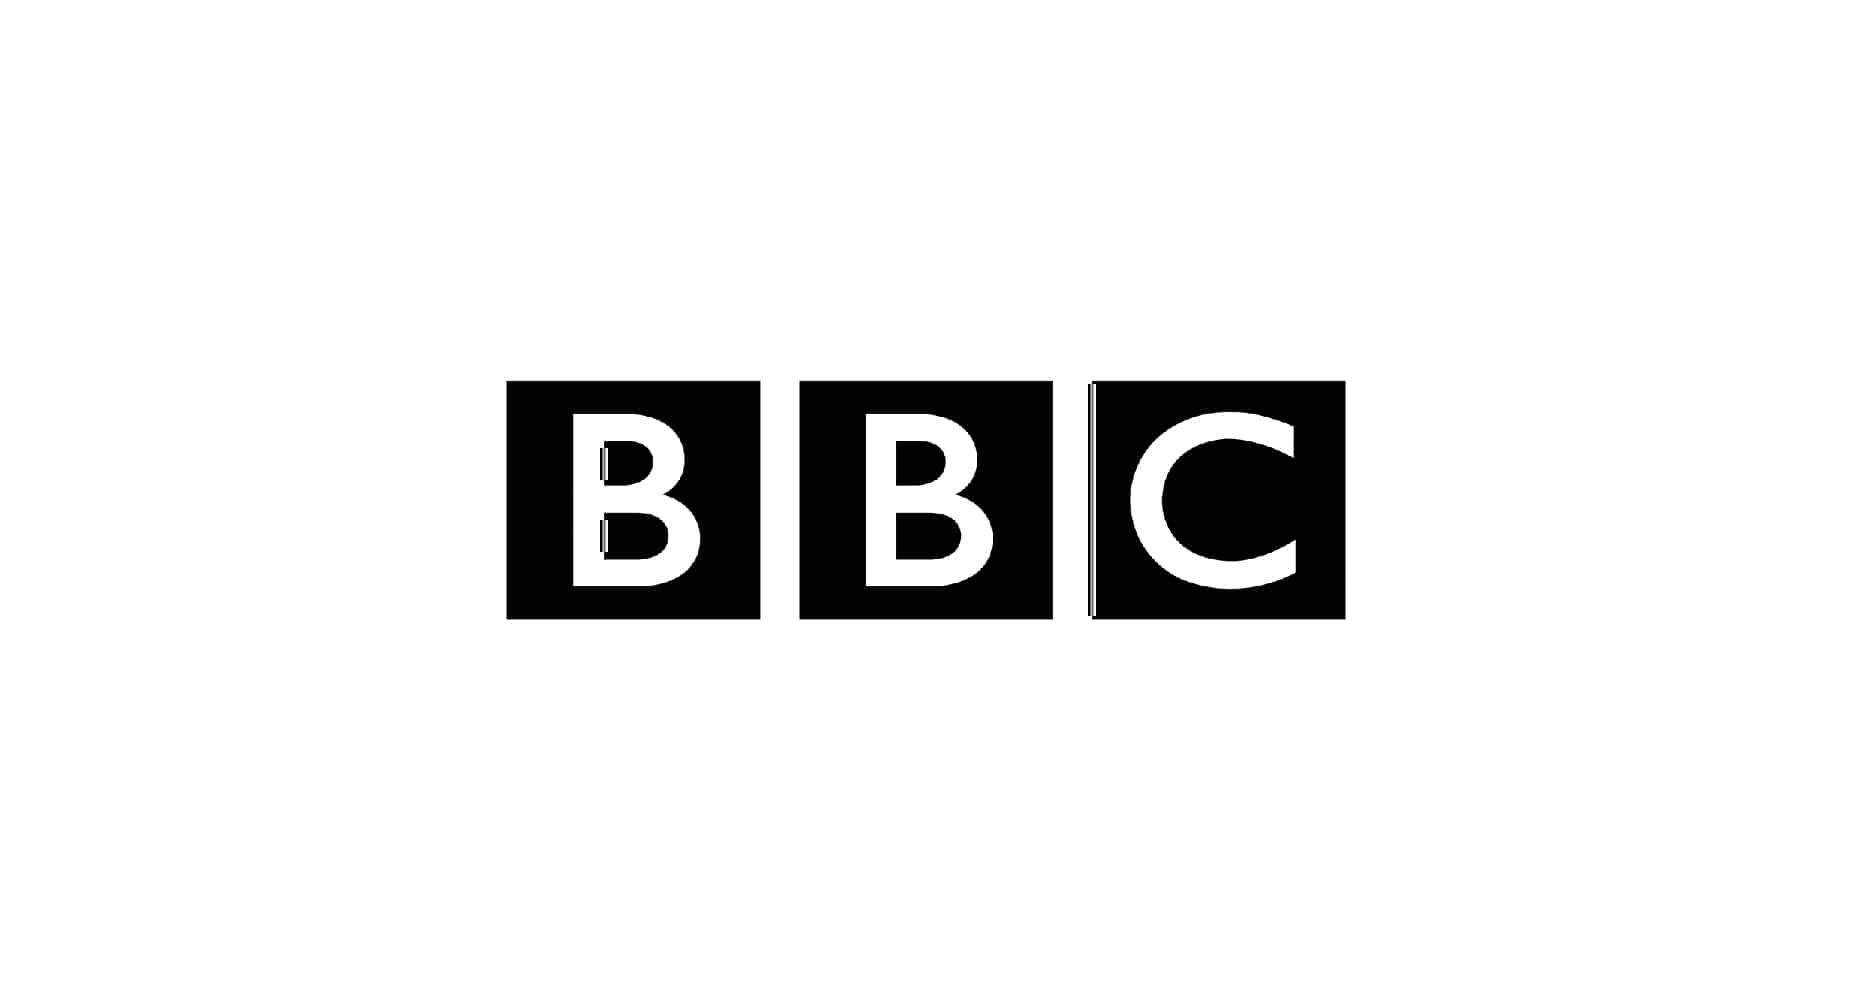 bbc branding